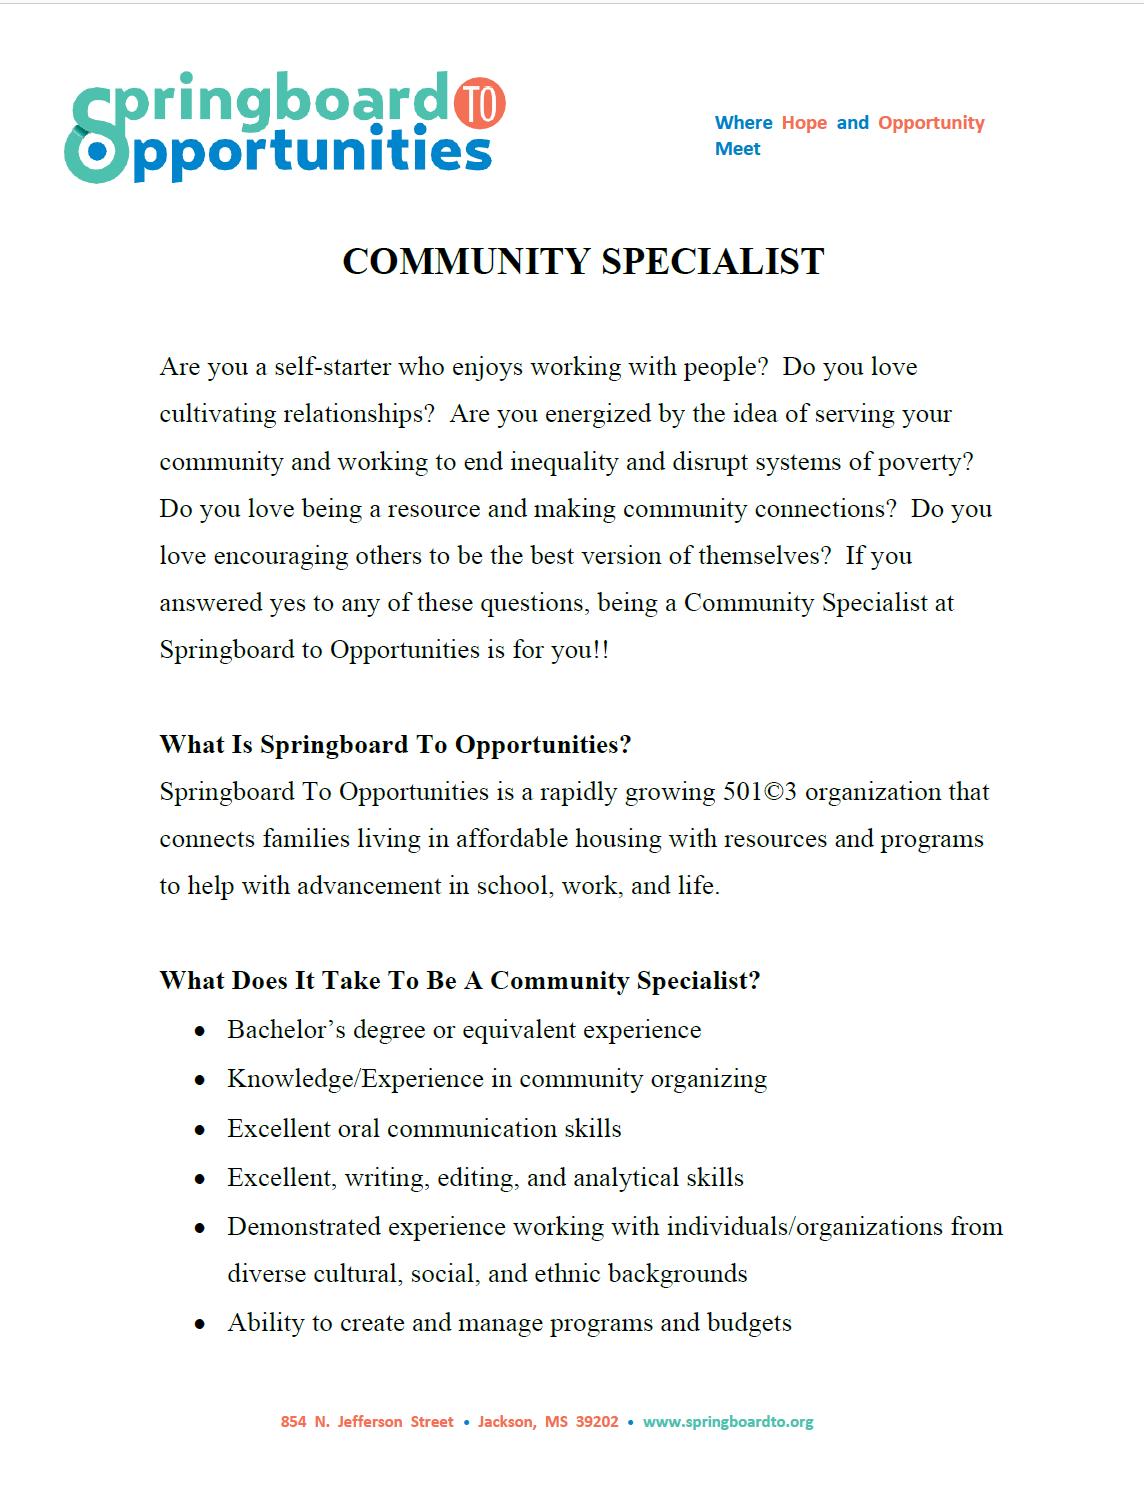 Community Specialist Job Description